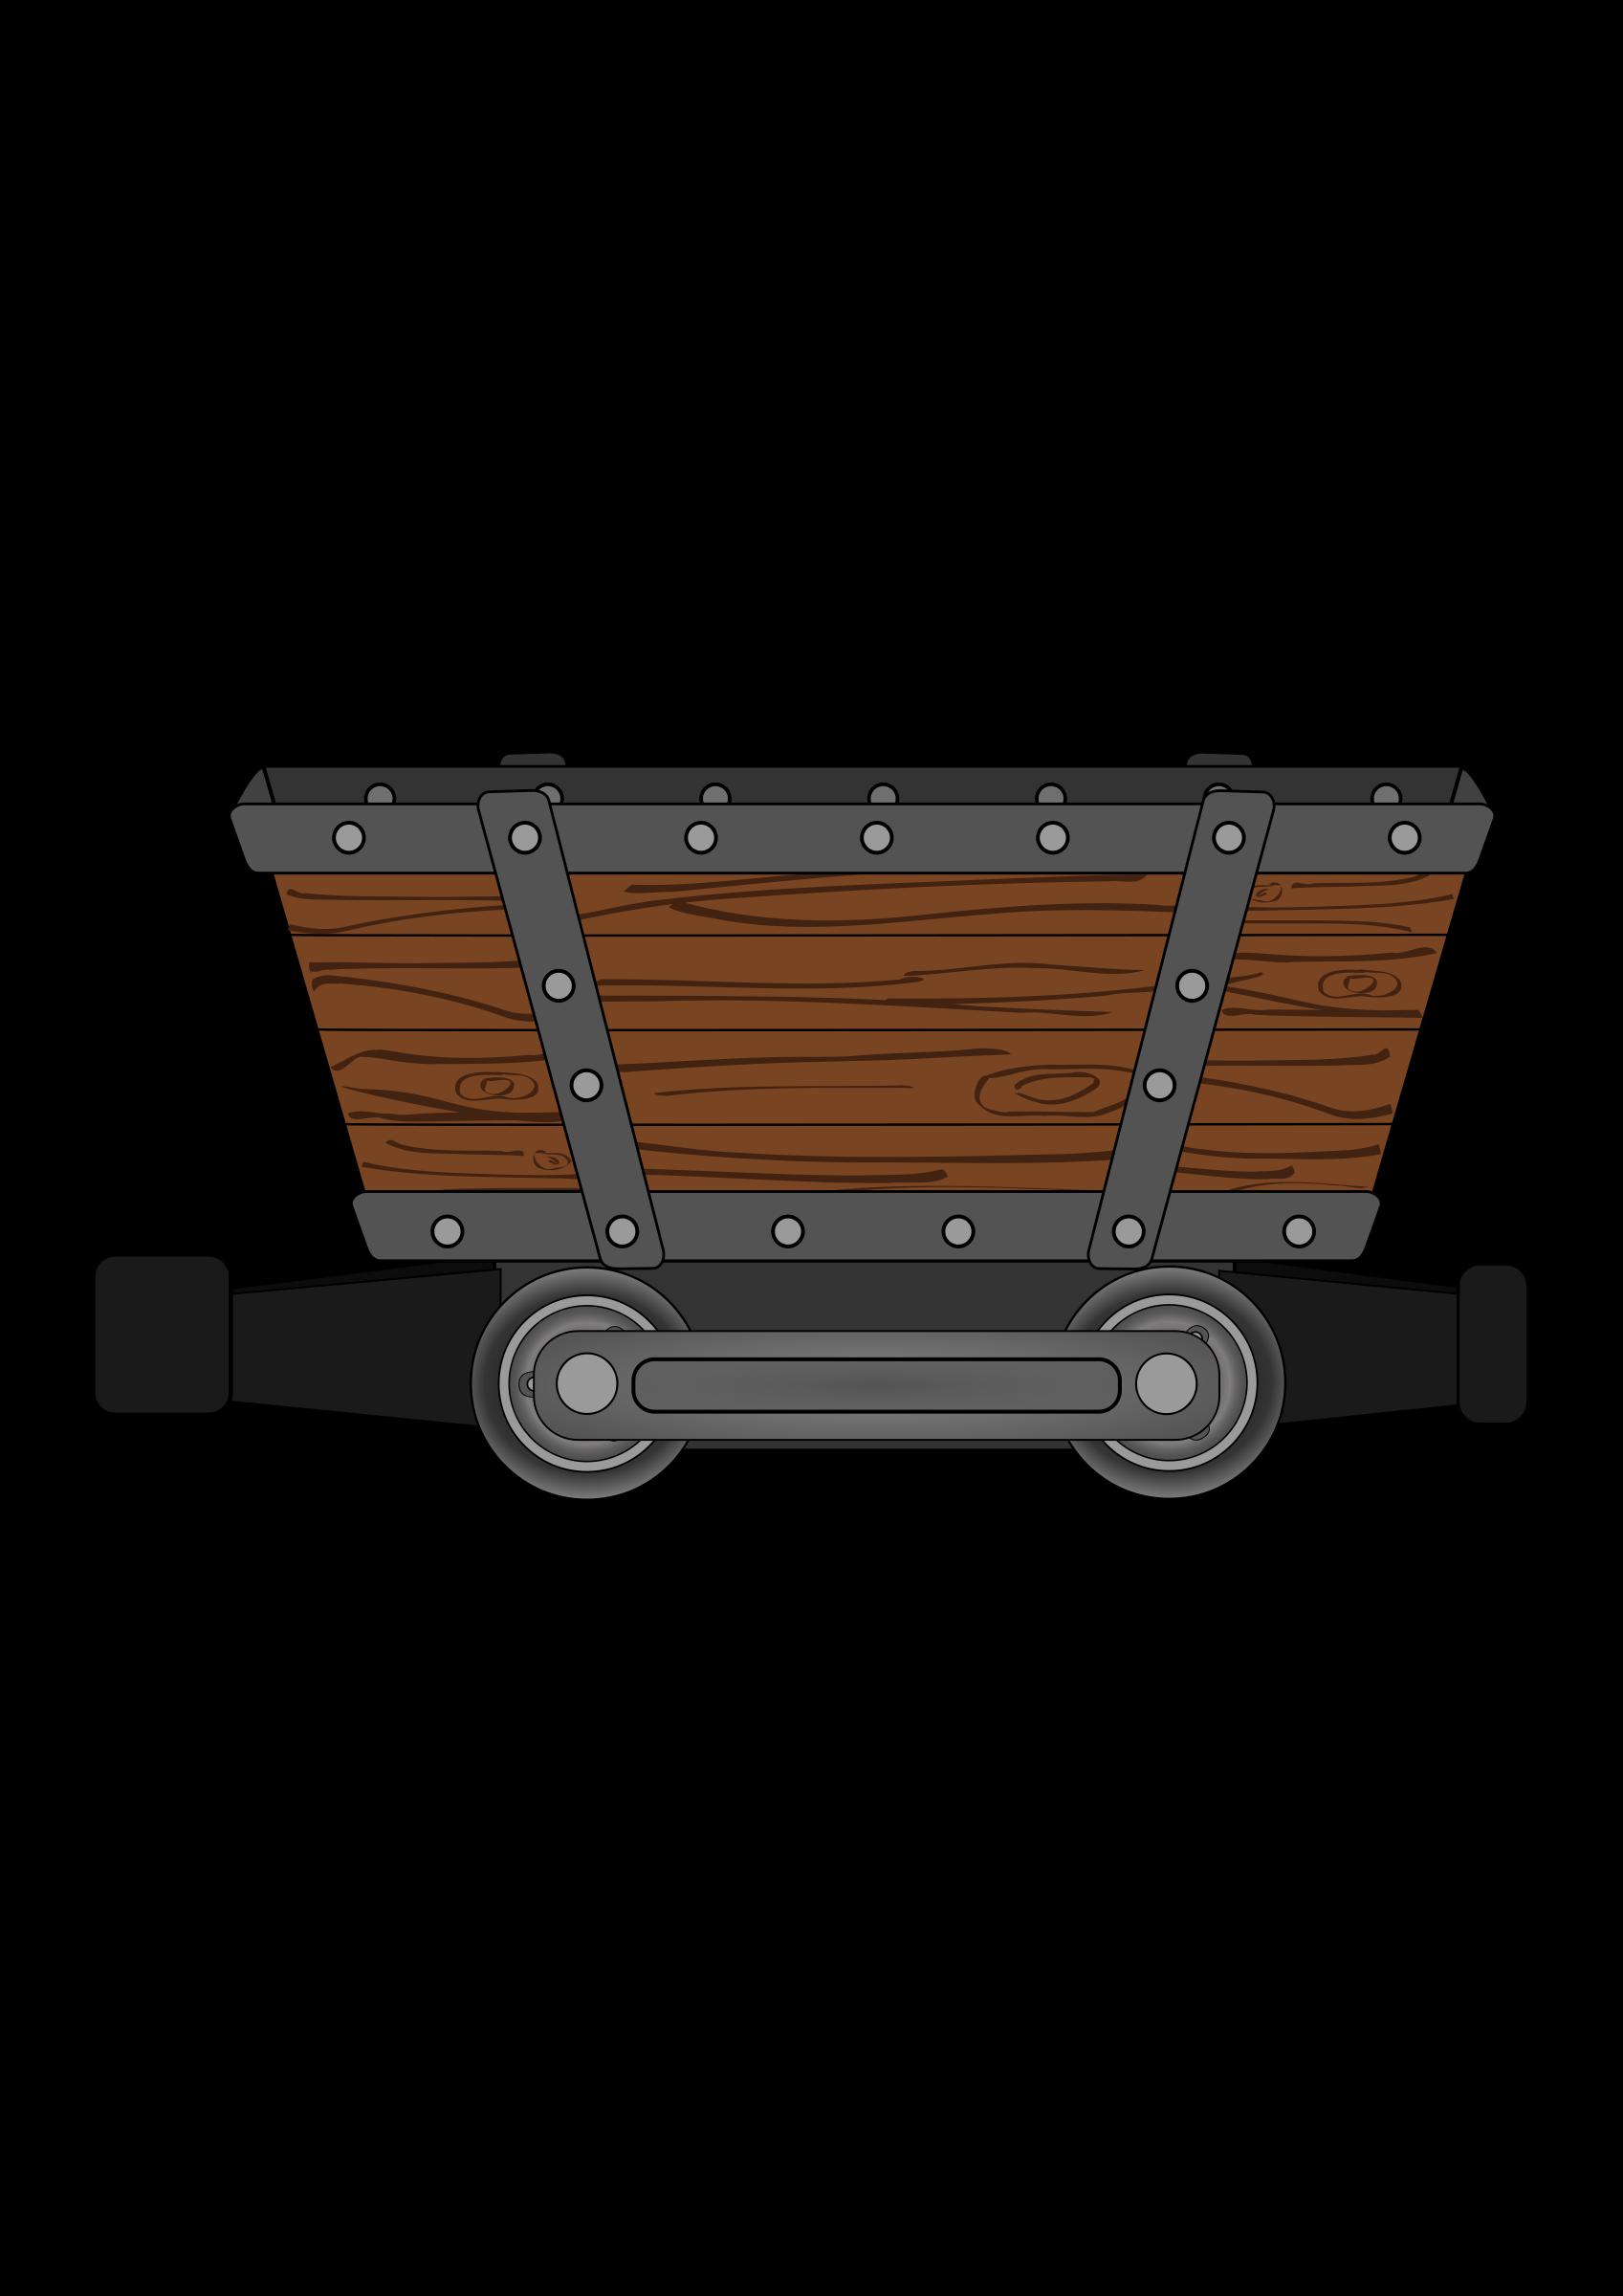 Coal clipart mine cart. Mining minecart shaft clip